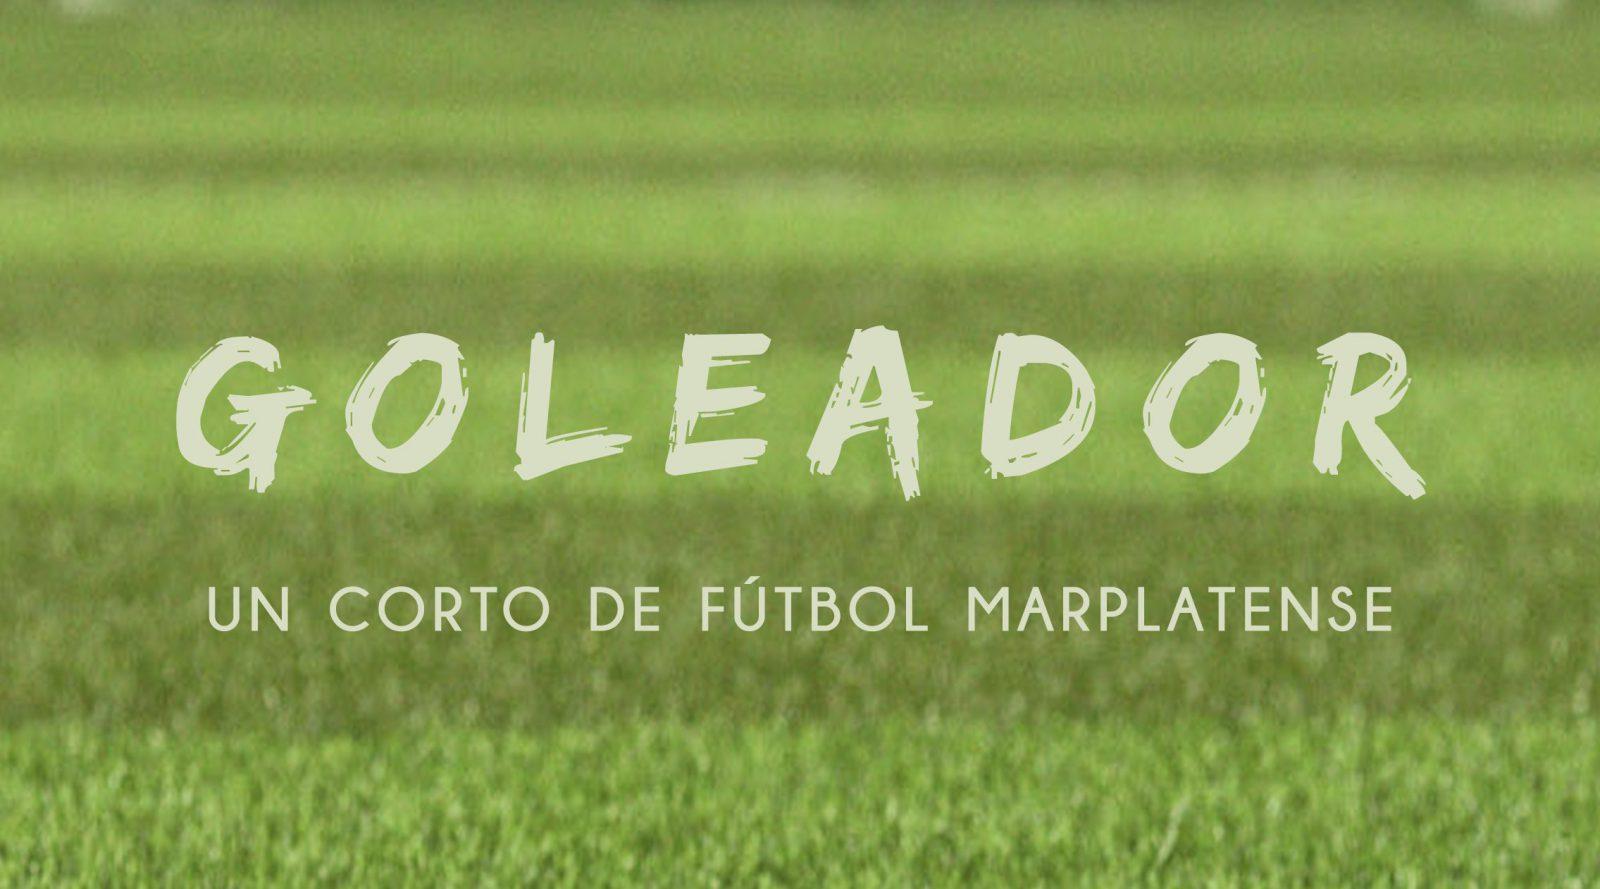 Goleador, cortometraje de Juan Boldini